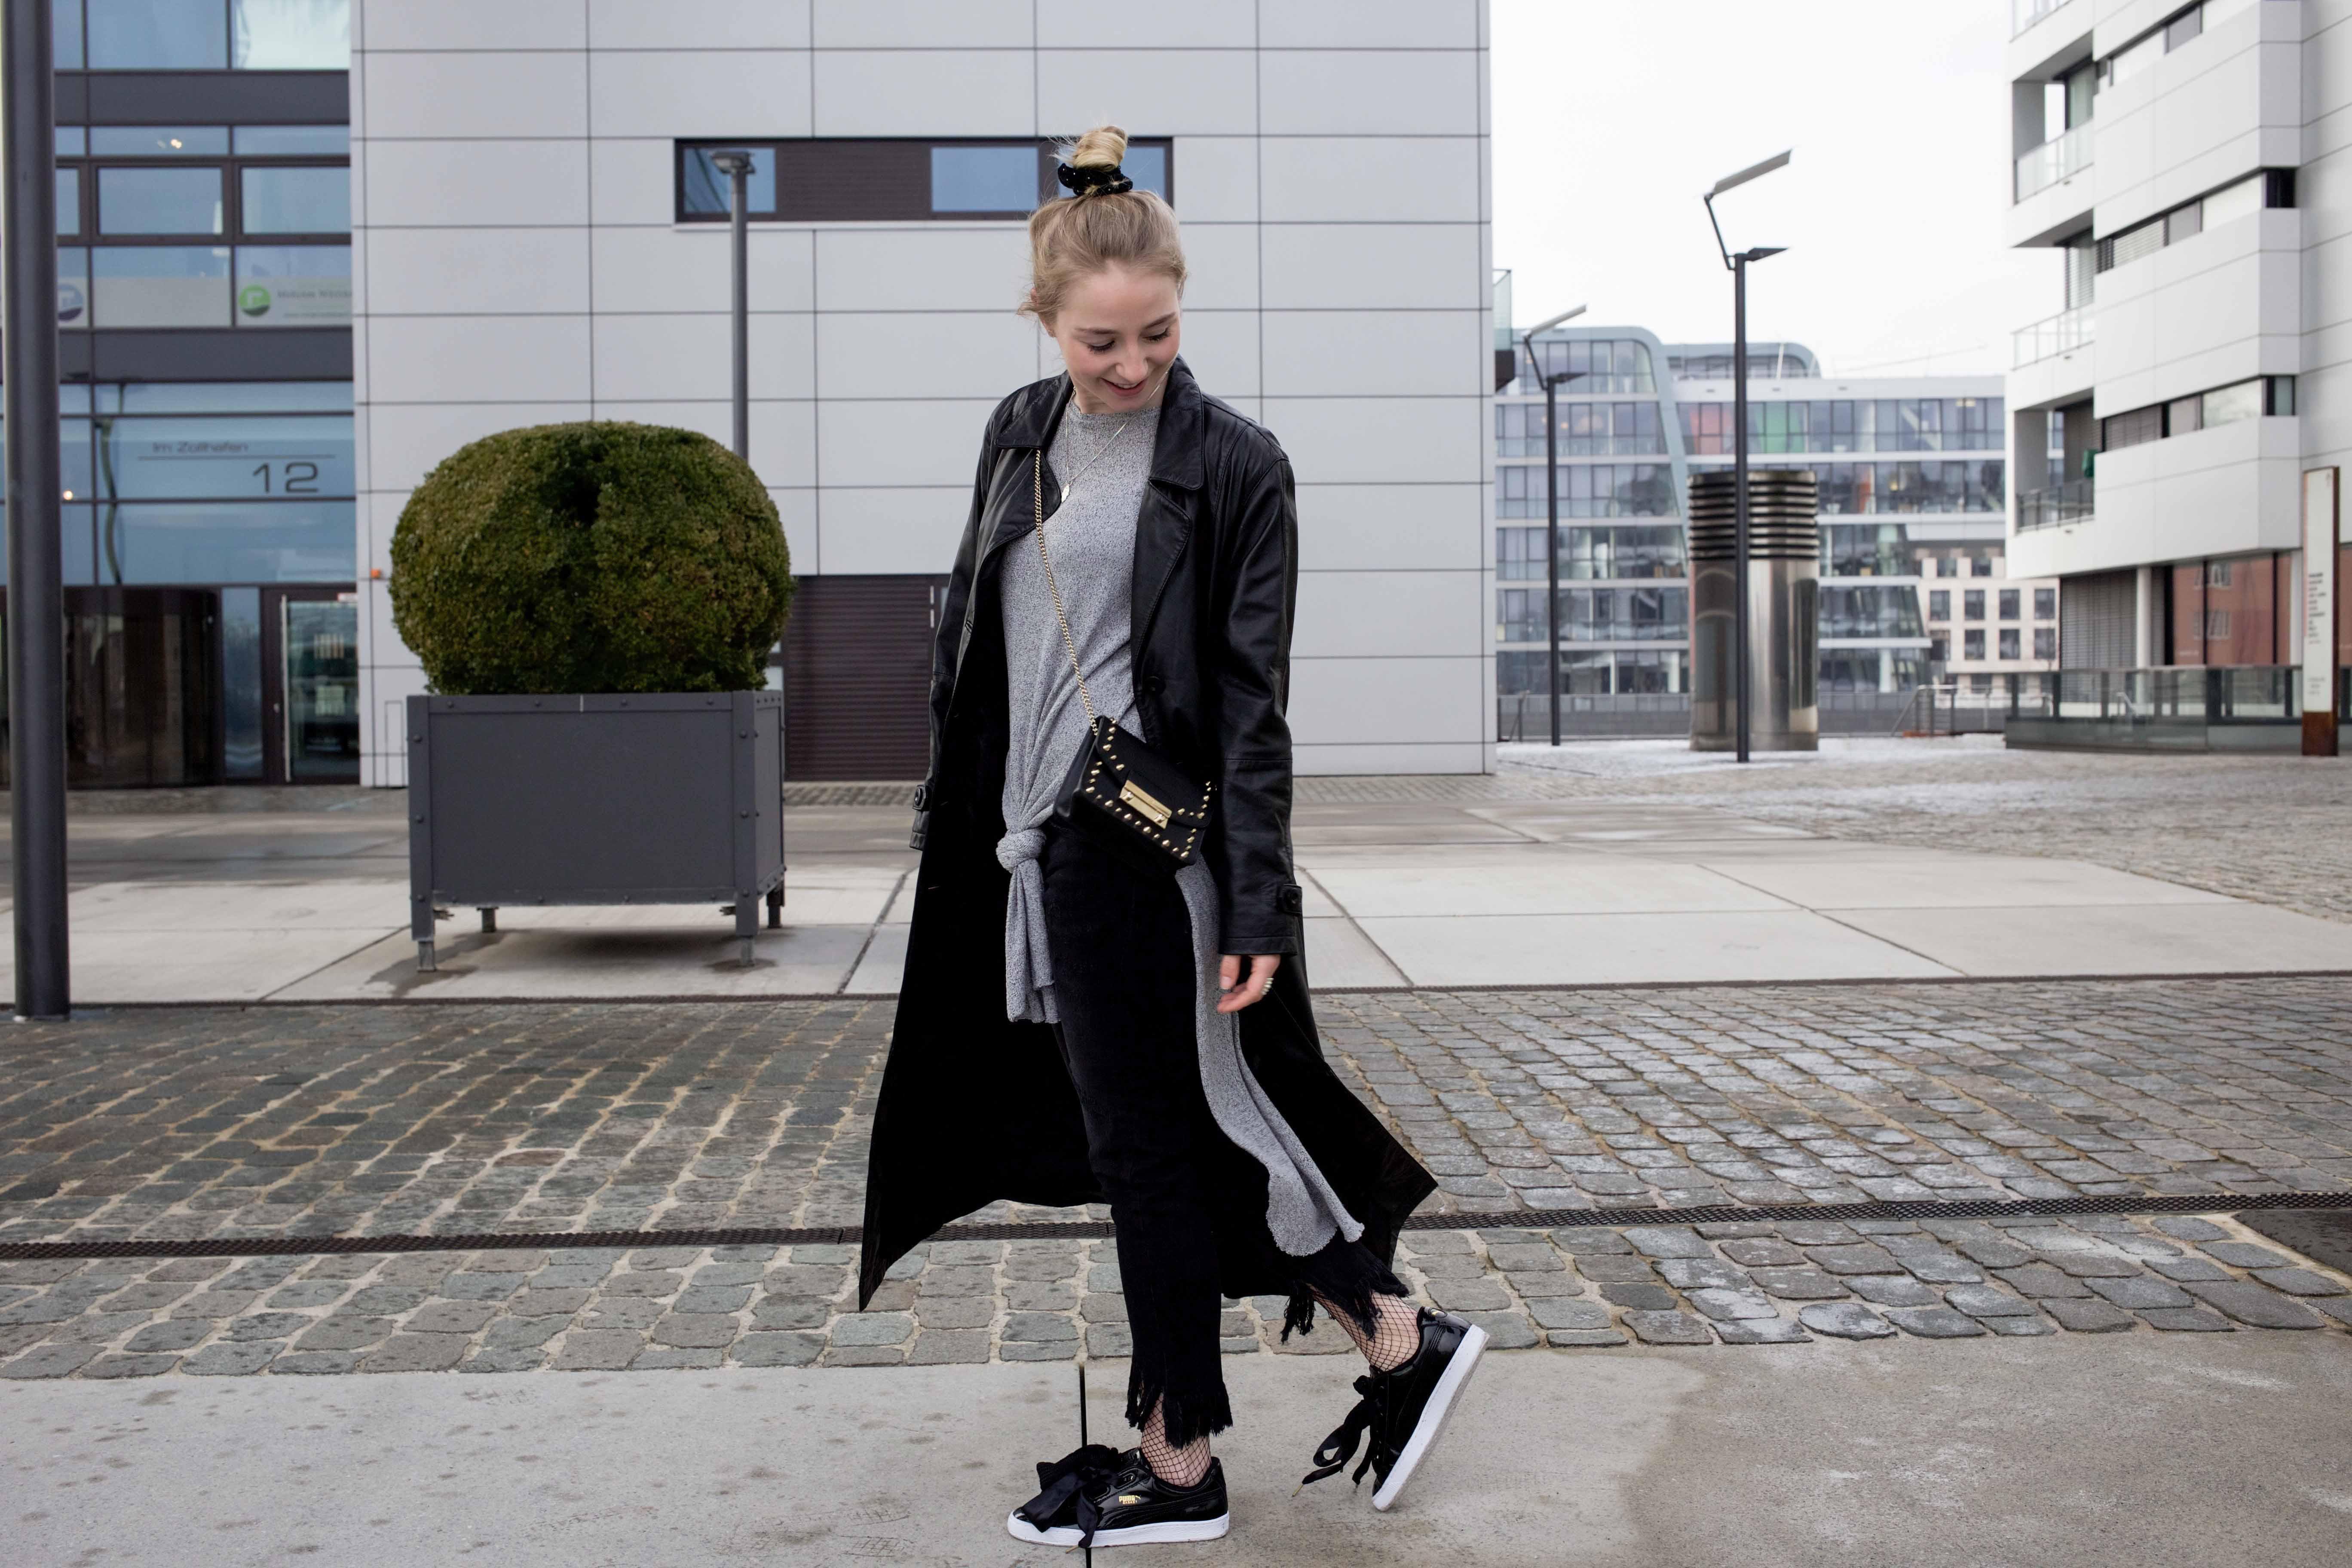 Netzstrumpfhose-kombinieren-Trend-Outfit-Fashionblog-PUMA-Basket-Ledermante_9485